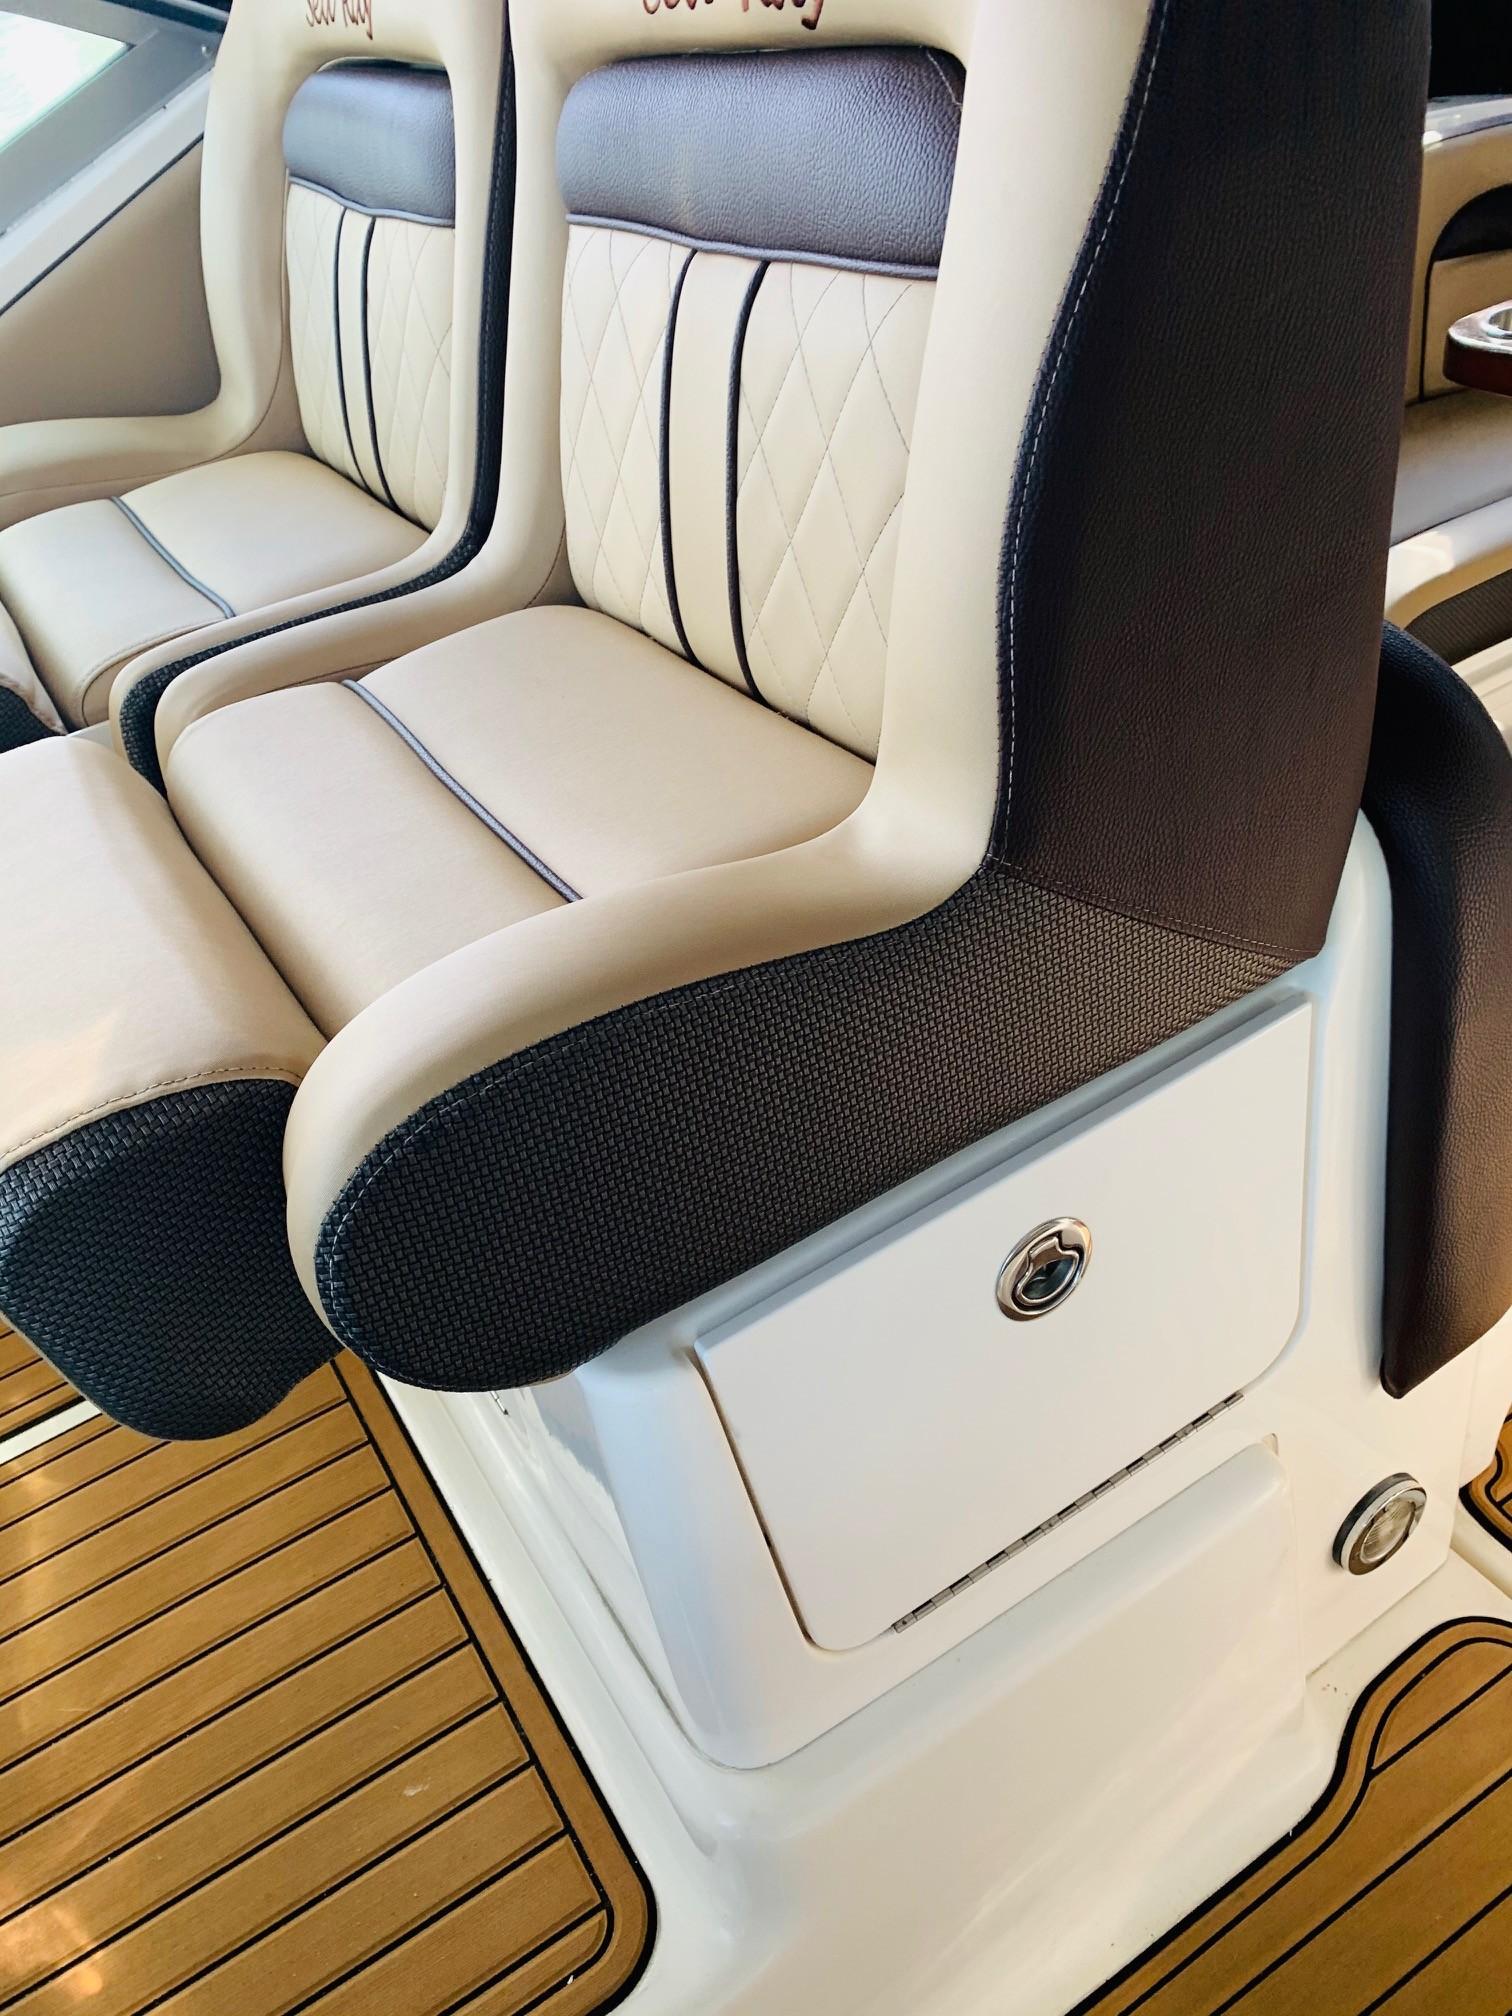 Sea Ray 320 Sundancer - Helm Seating 5